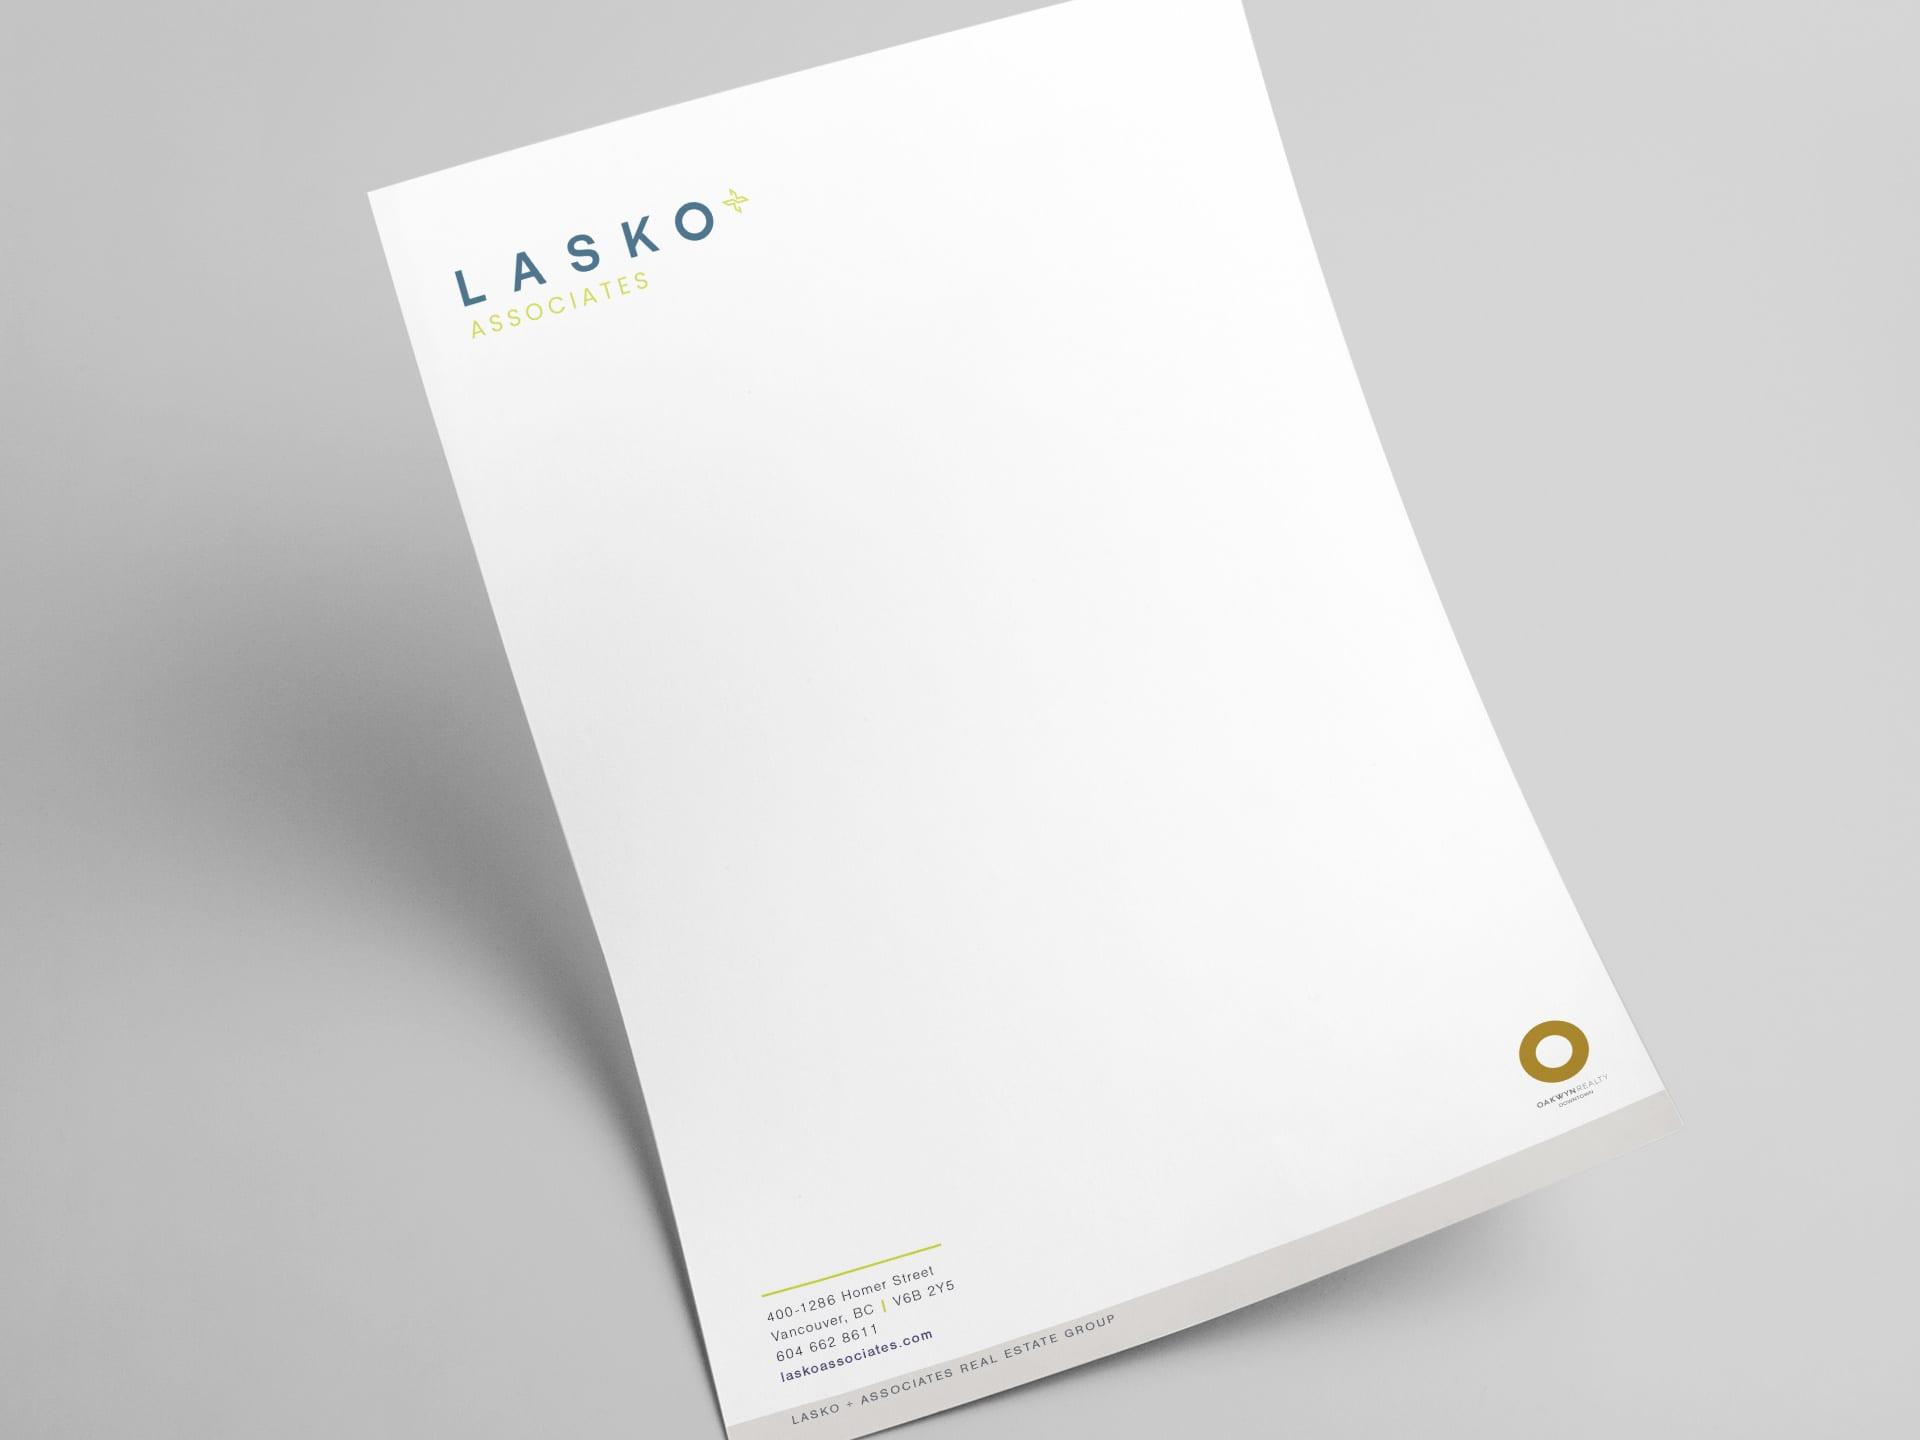 Y5 Creative Case Studies 2019 Letterhead Lasko And Associates Real Estate Group